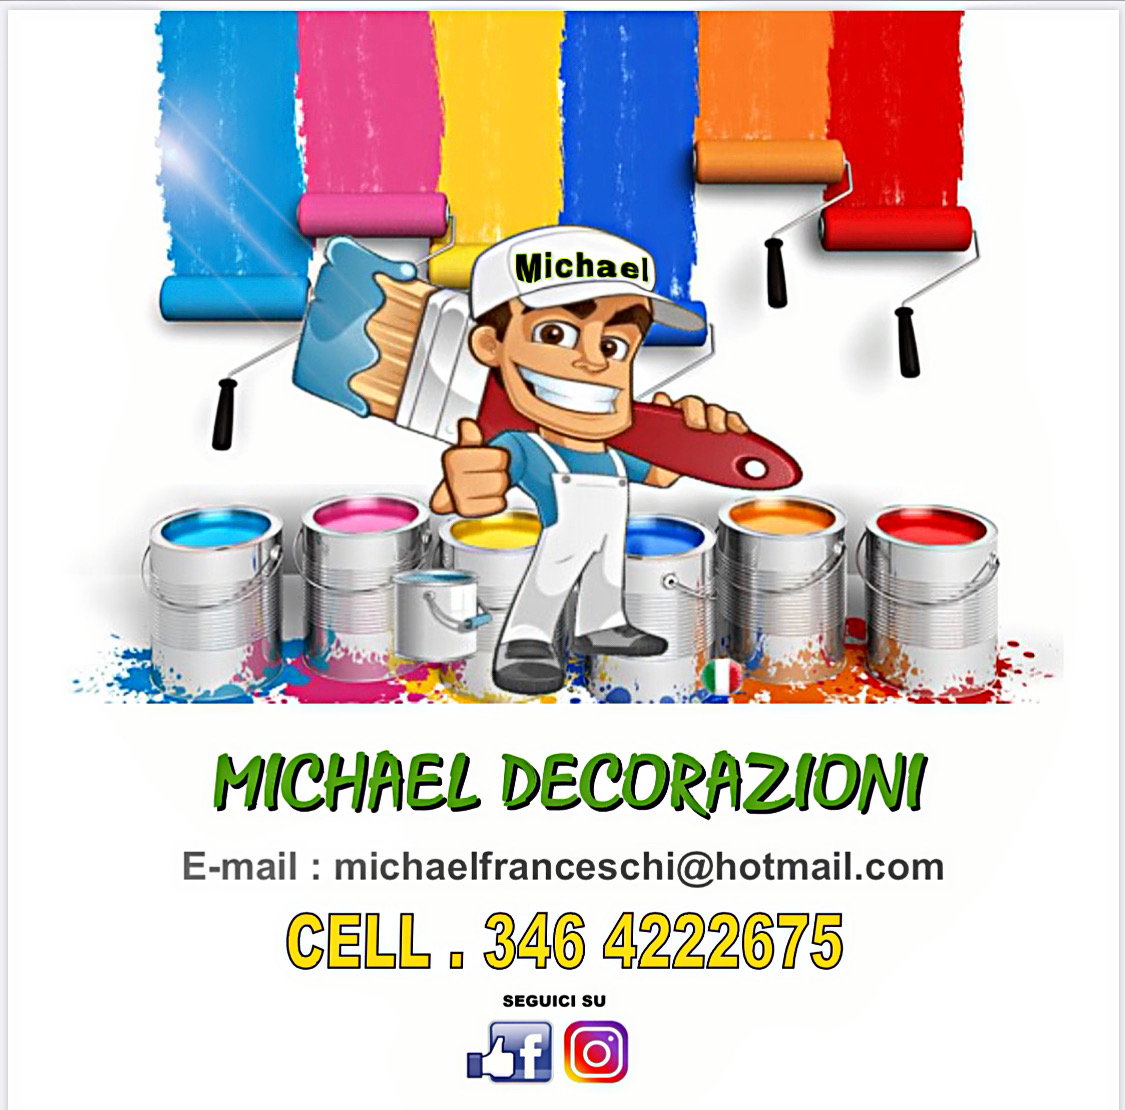 Michael Franceschi